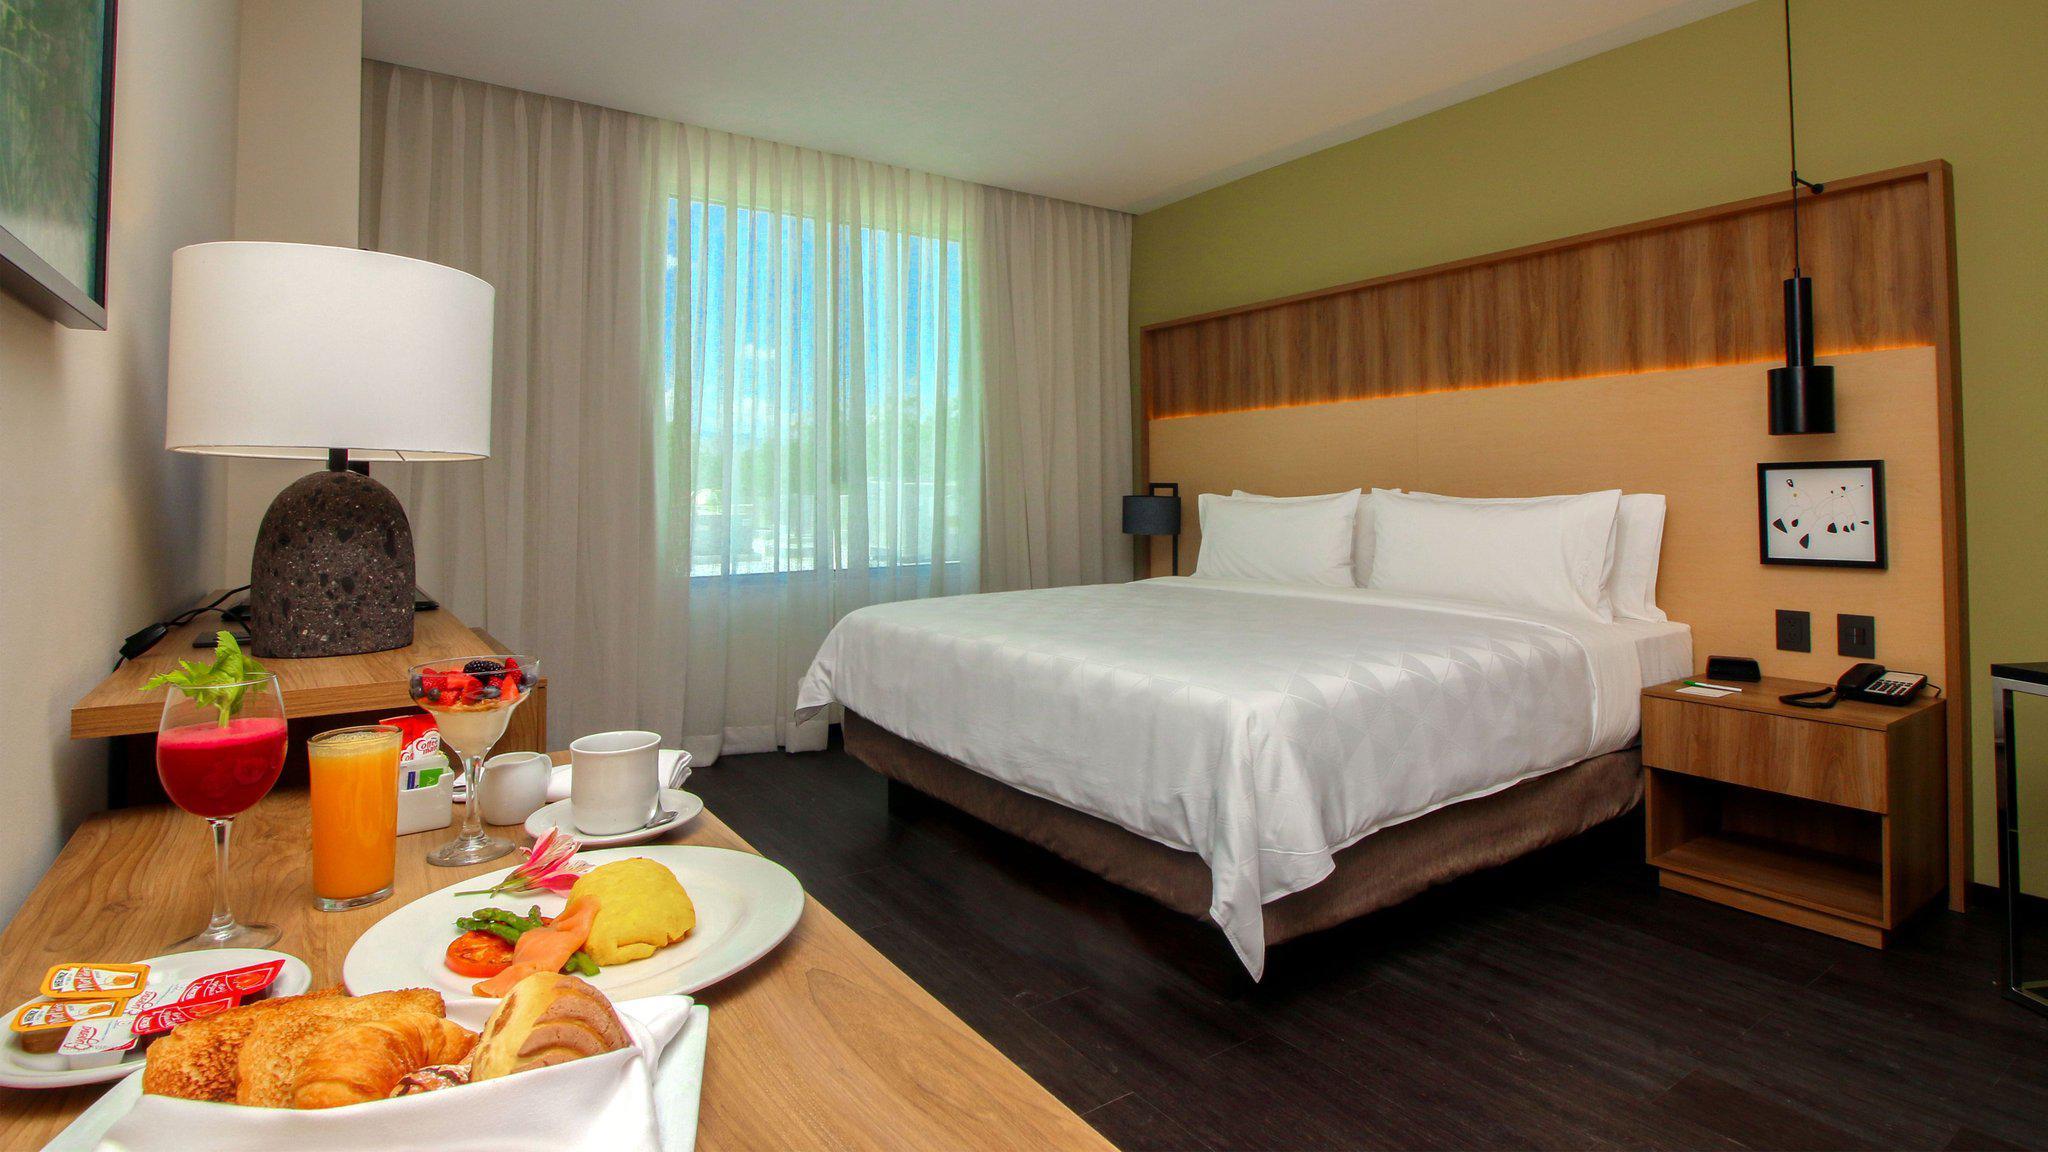 Holiday Inn San Luis Potosi-Quijote, an IHG Hotel